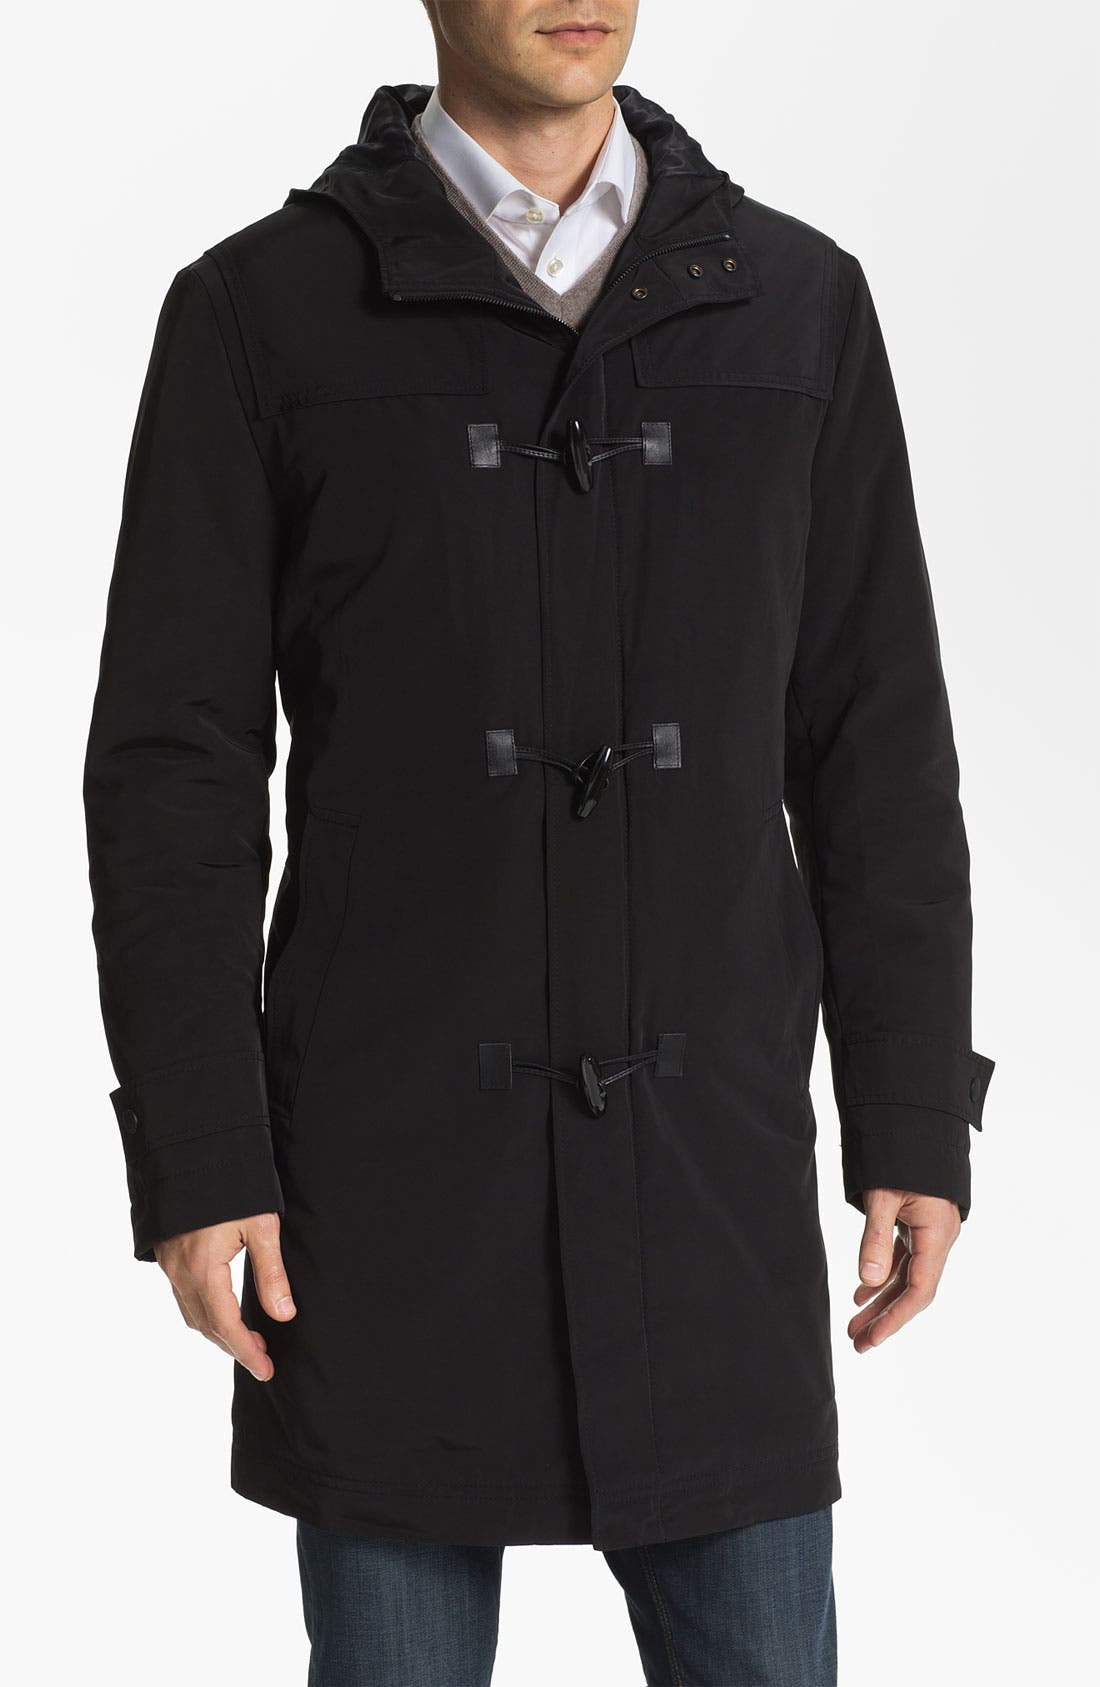 Alternate Image 1 Selected - BOSS Black 'Glade' Wrinkle Resistant Duffle Coat